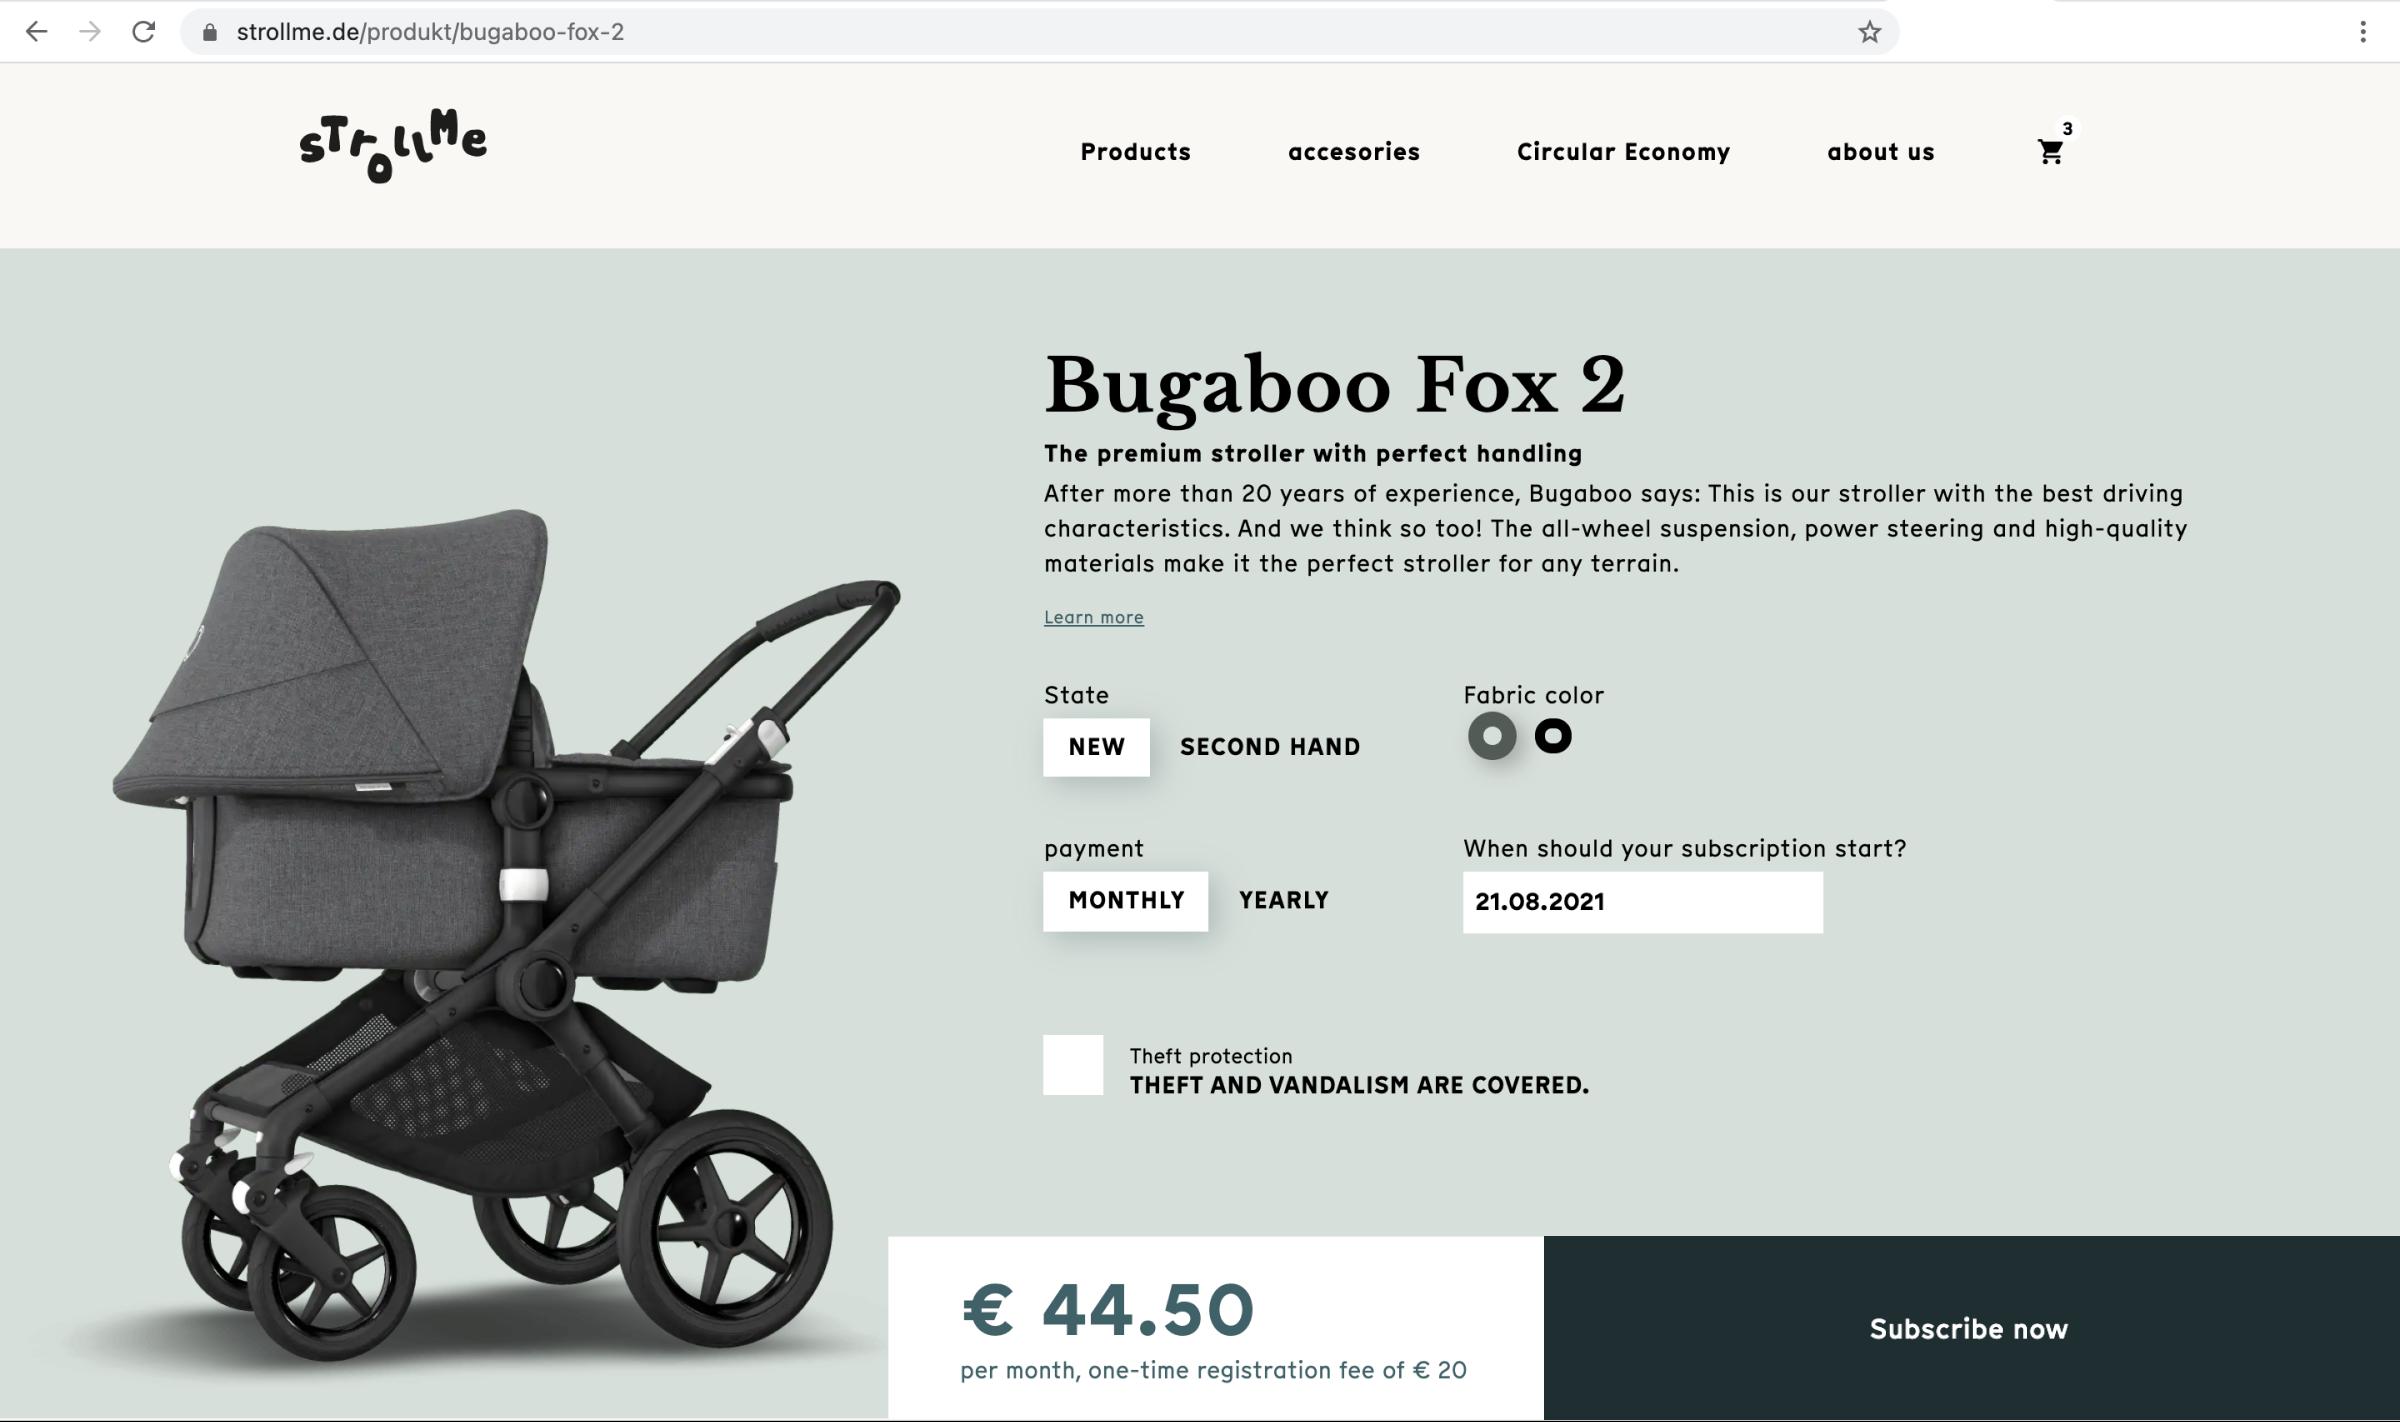 ScreenShot Strollme Website